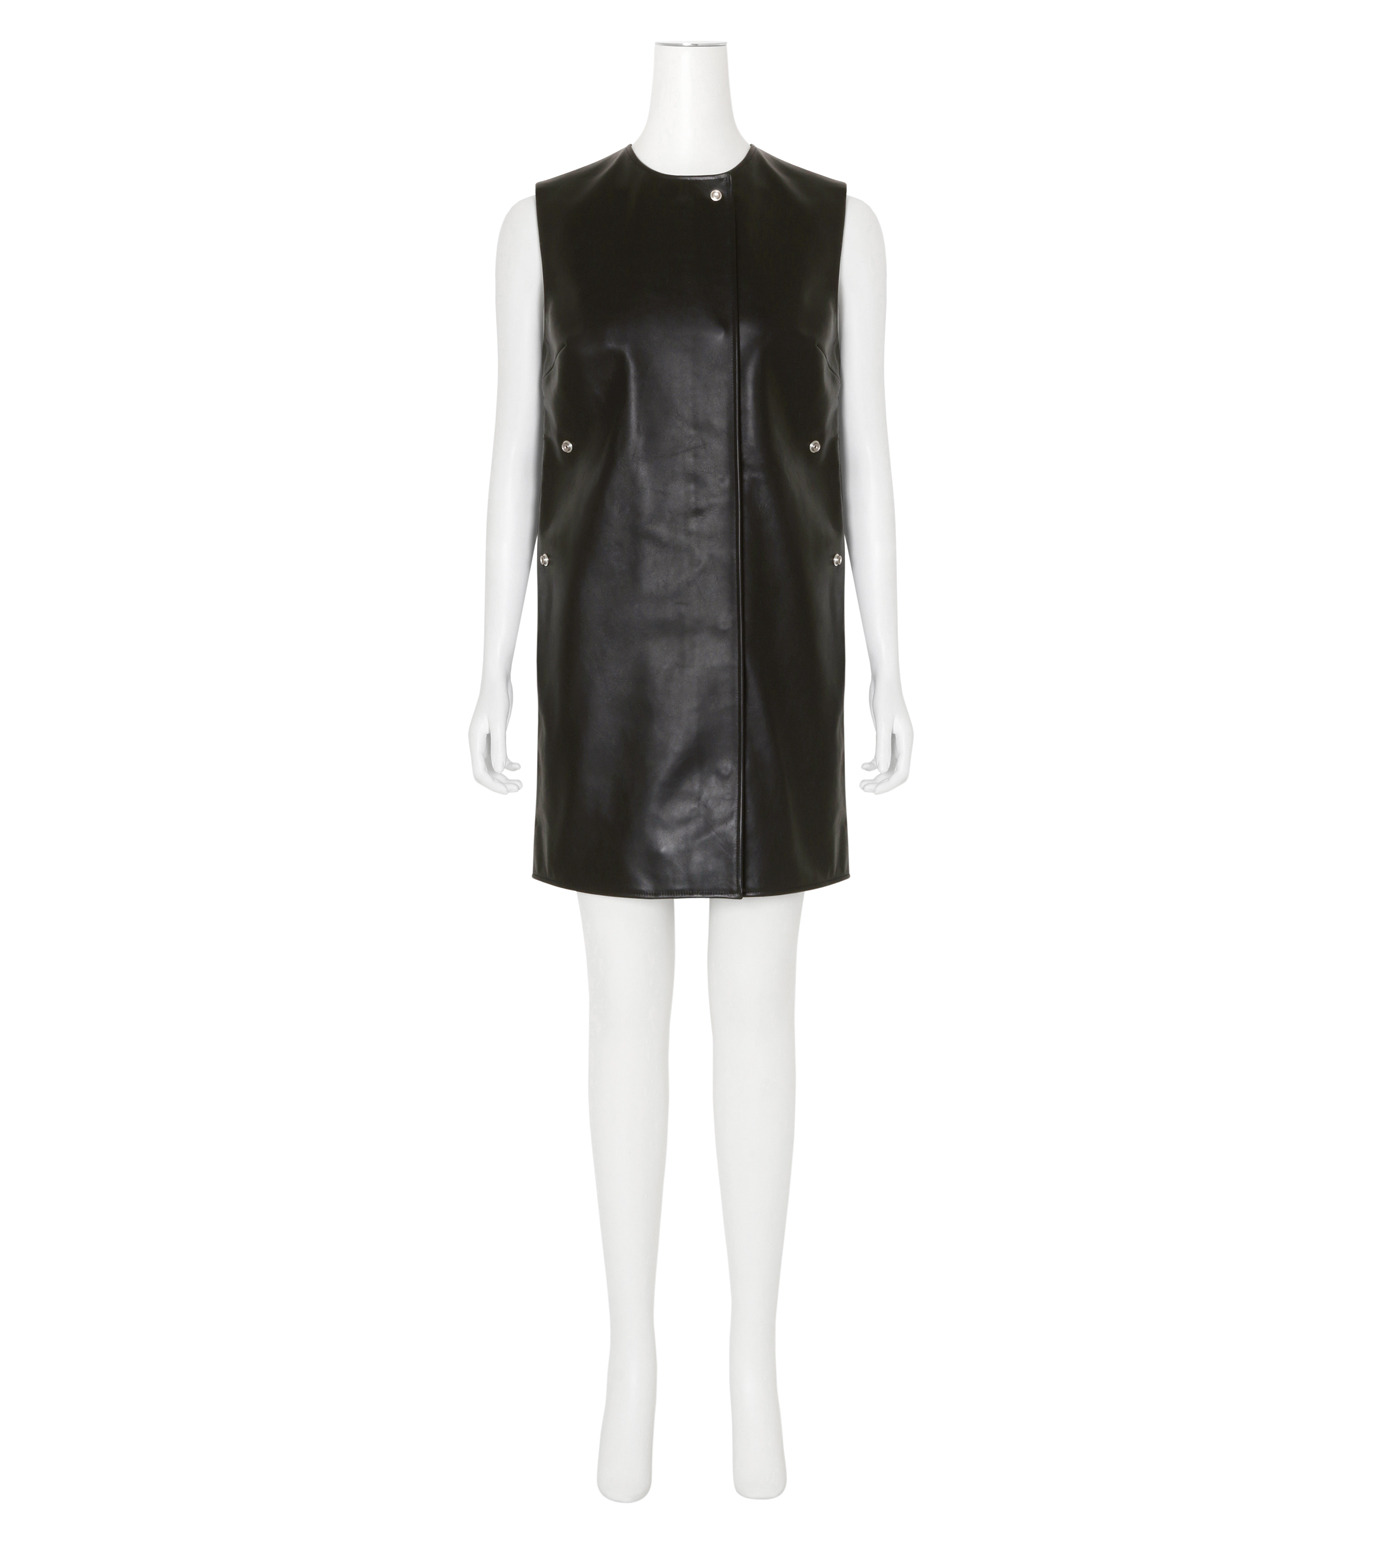 ACNE STUDIOS(アクネ ストゥディオズ)のCow Leather Sless Dress-BLACK(ワンピース/one piece)-1AJ164-13 拡大詳細画像1